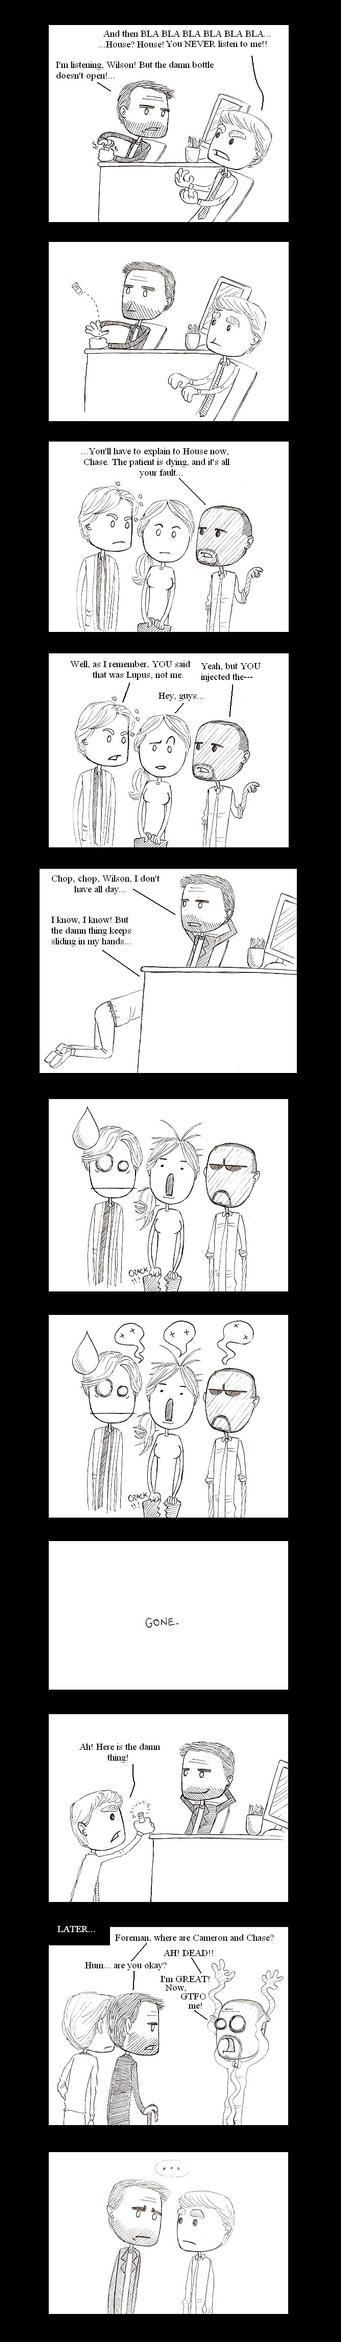 Easily Misunderstood by wolfKardia